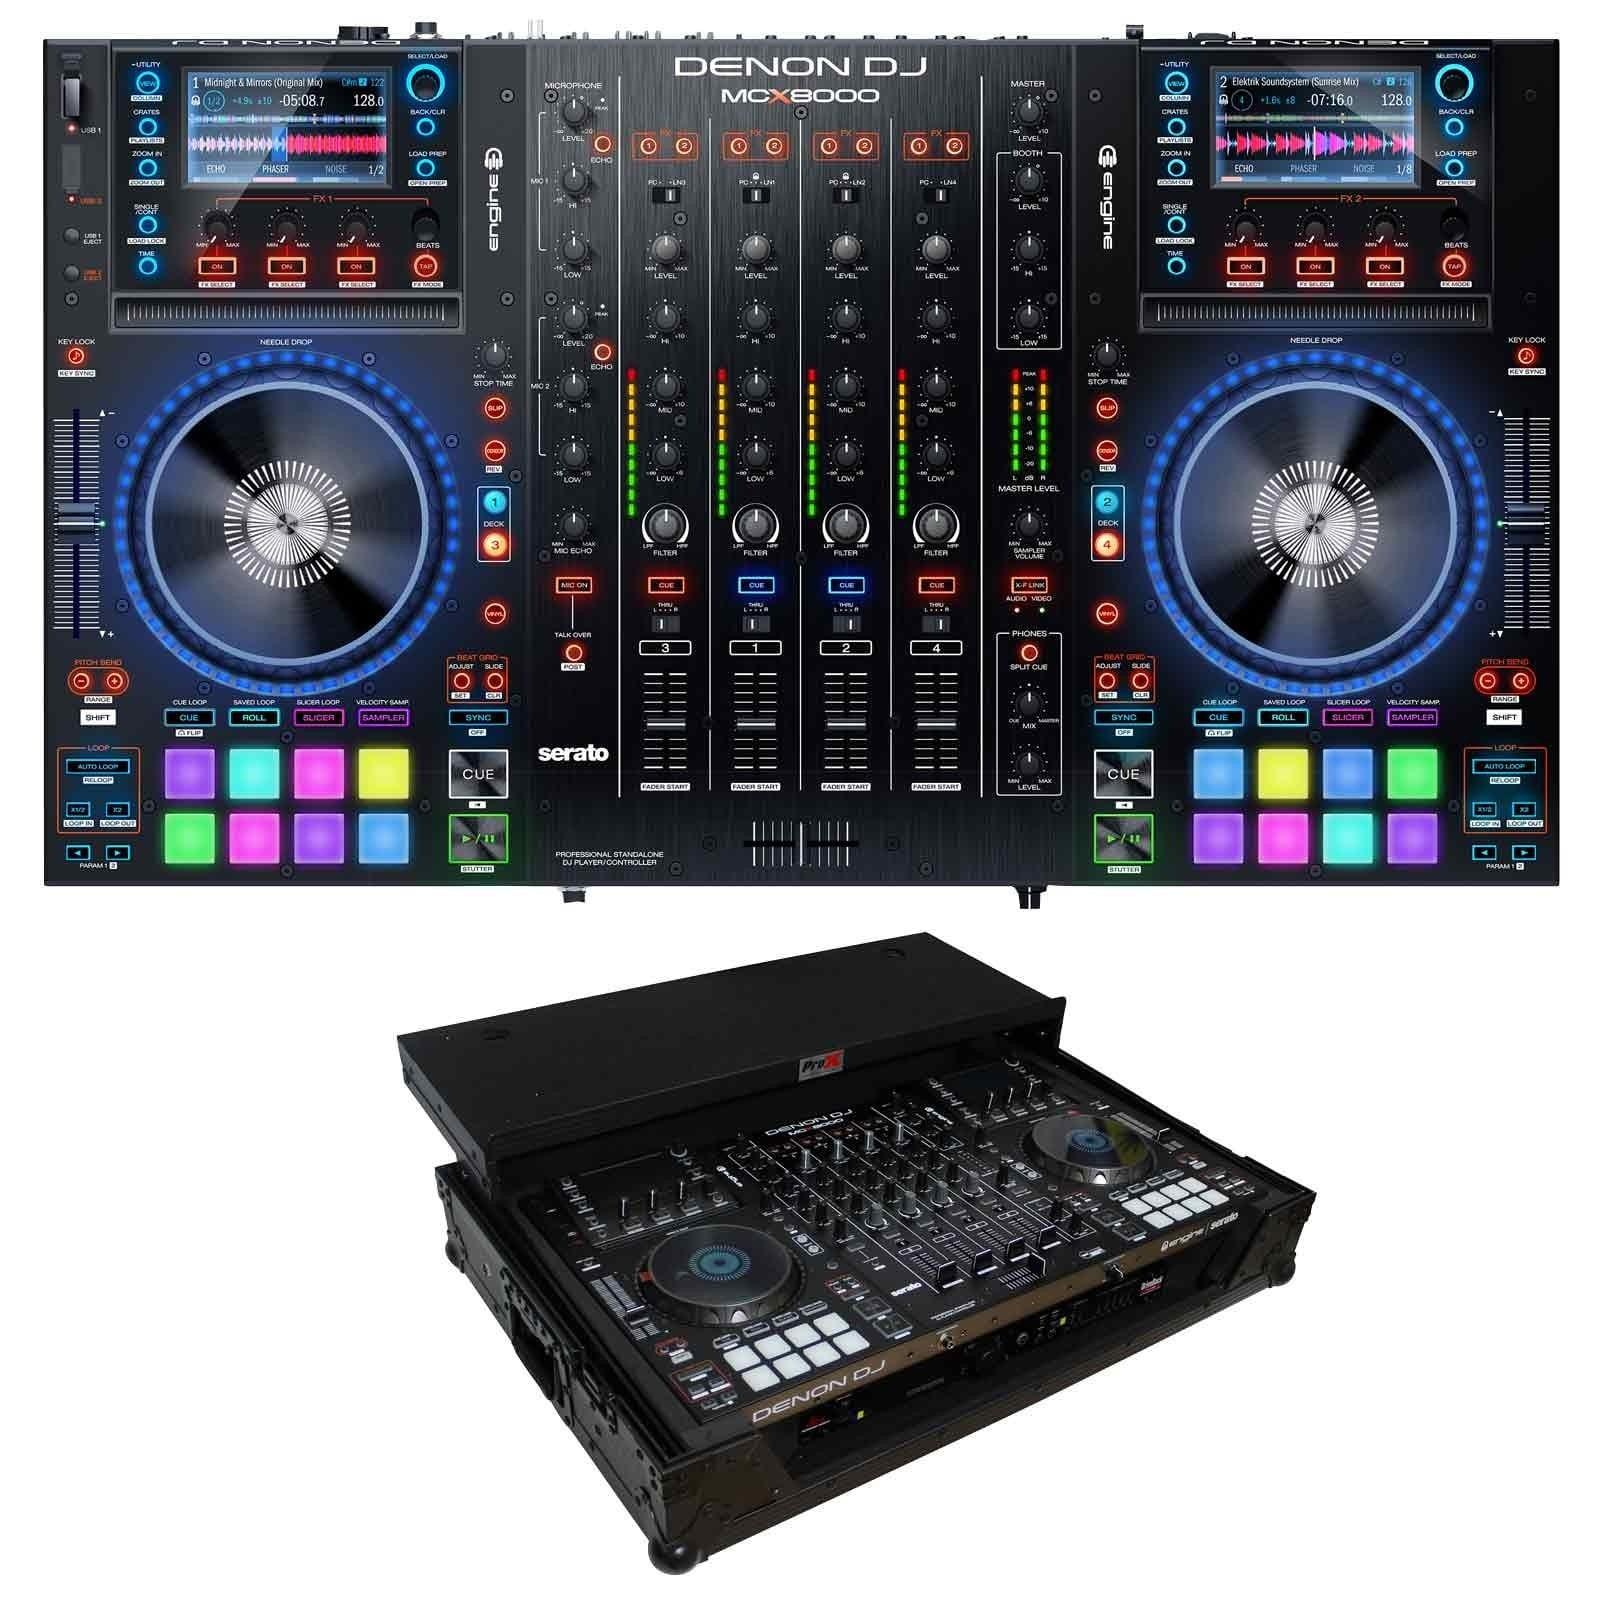 denon-dj-mcx8000-standalone-dj-player-and-dj-controller-black-flight-case-package-30c.jpg